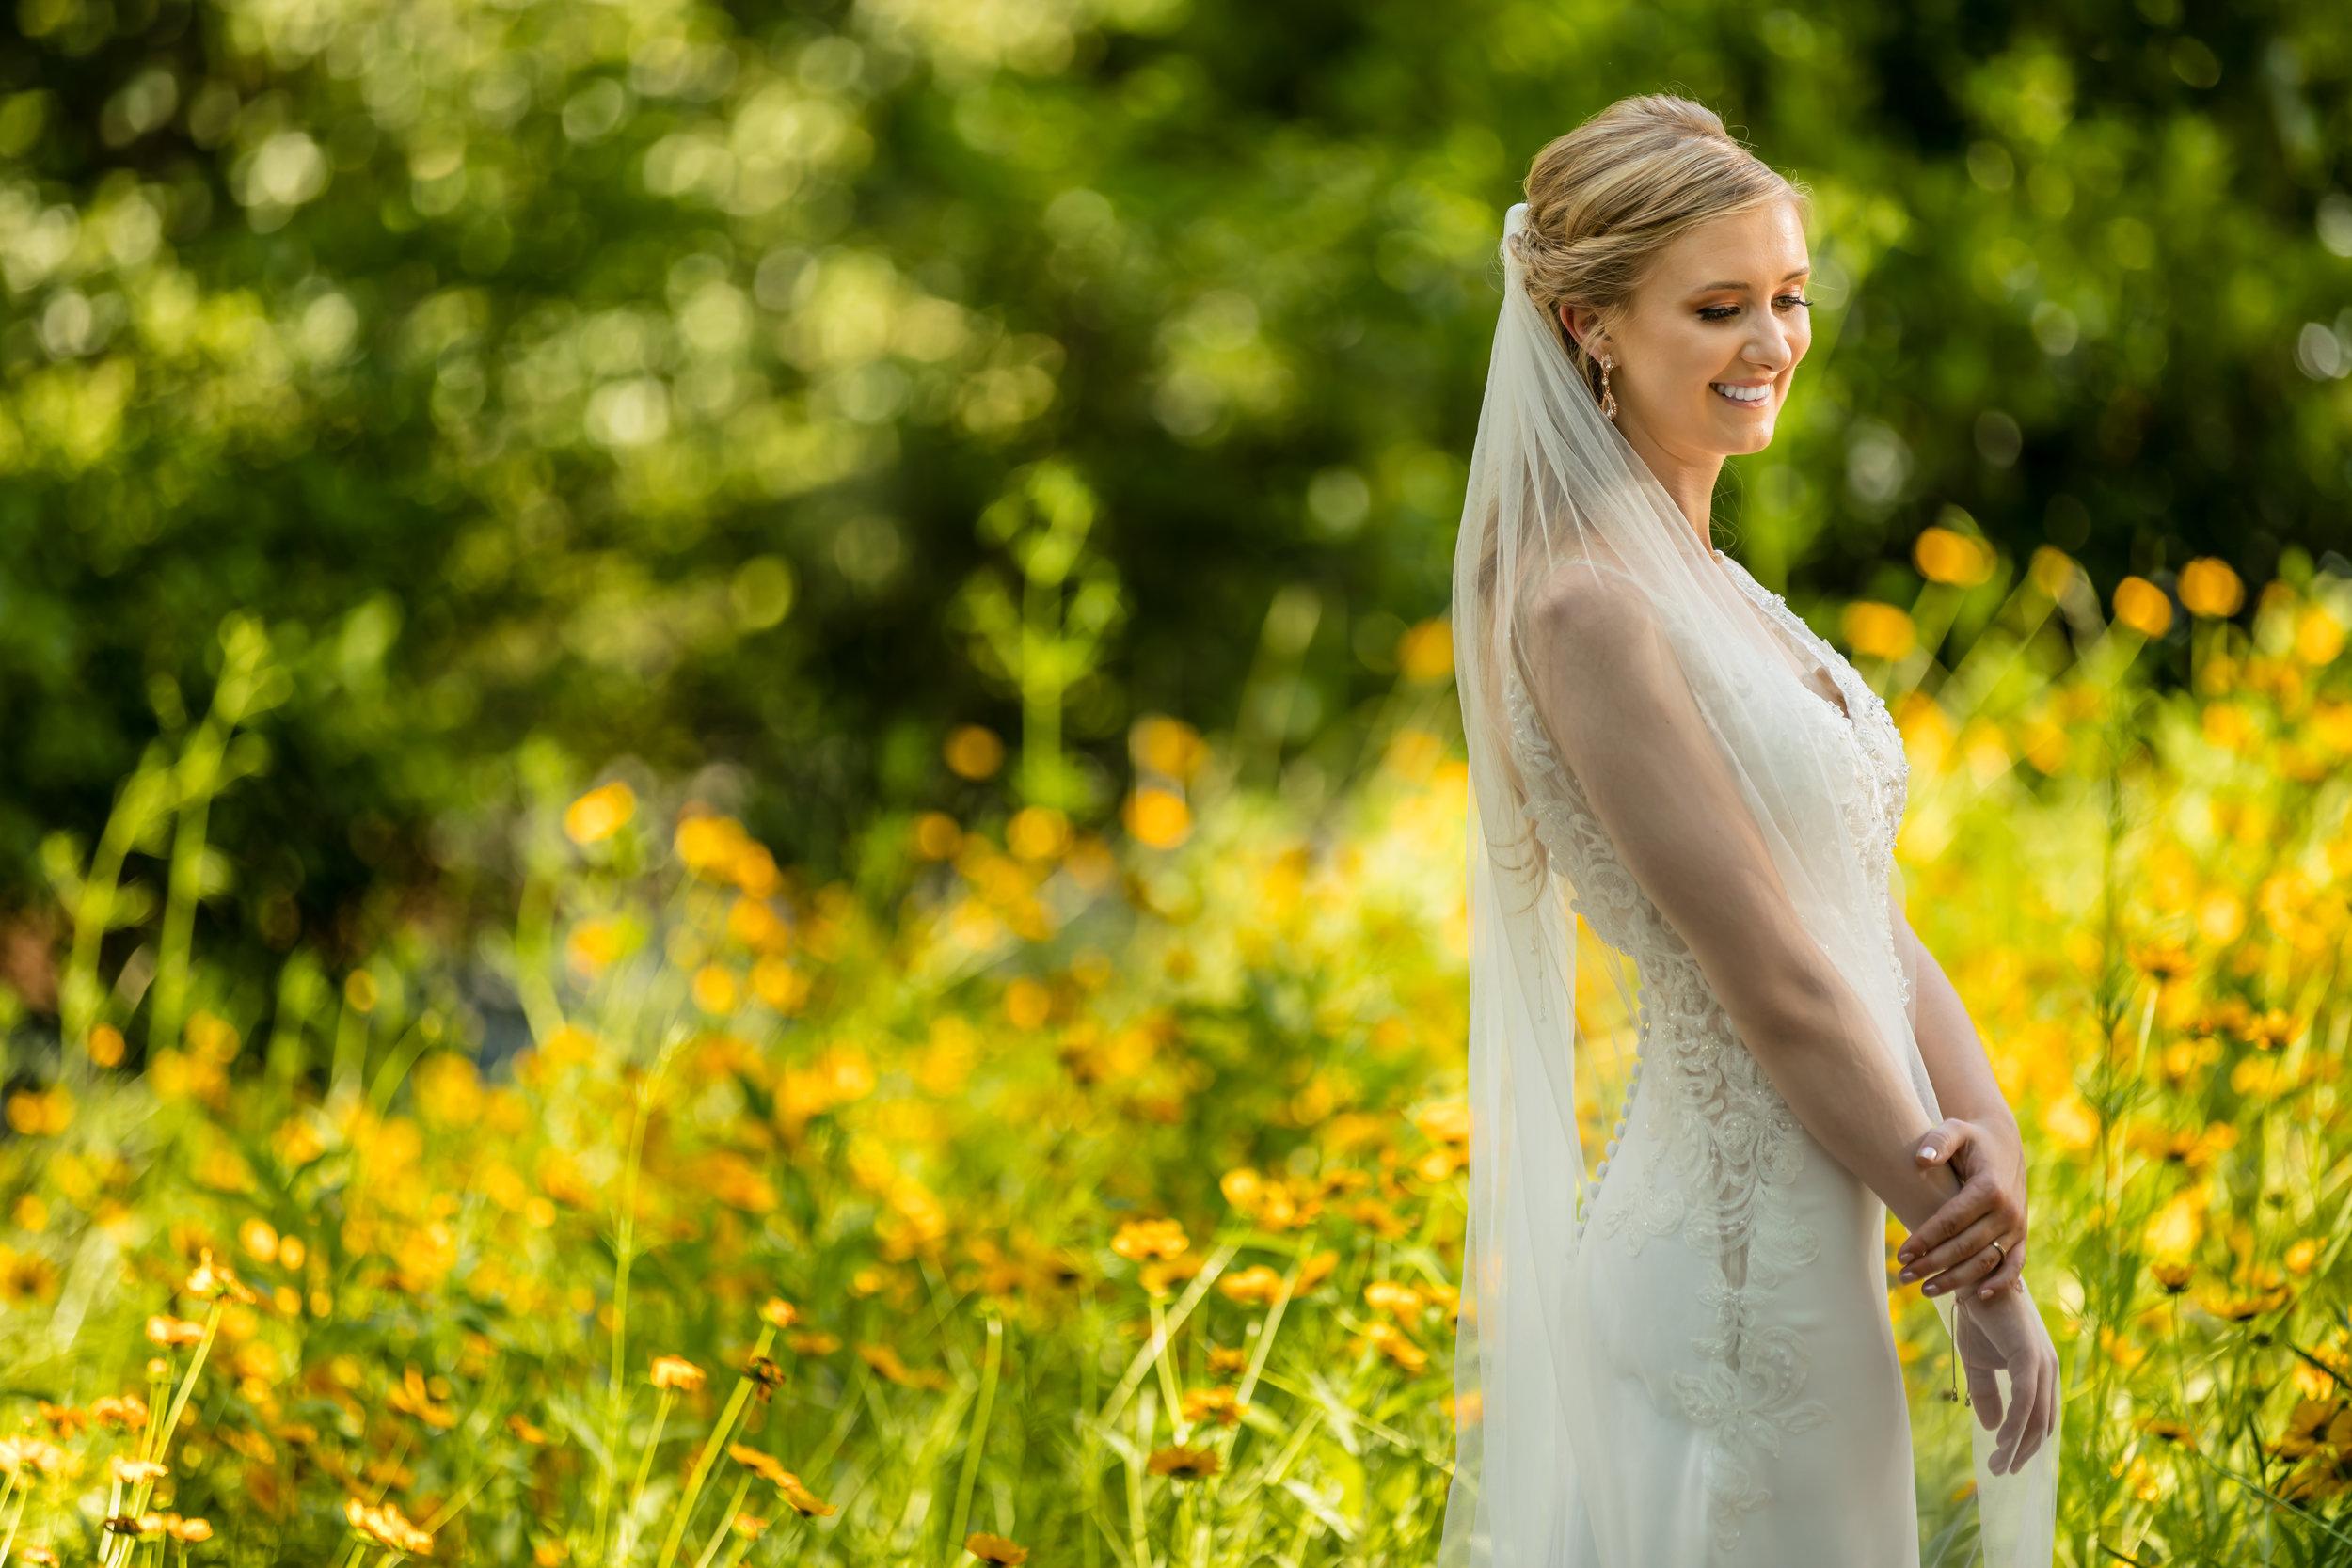 sarah_ikeem_wedding_at_the_parlour_at_manns_chapel_05.18.19-0350.jpg